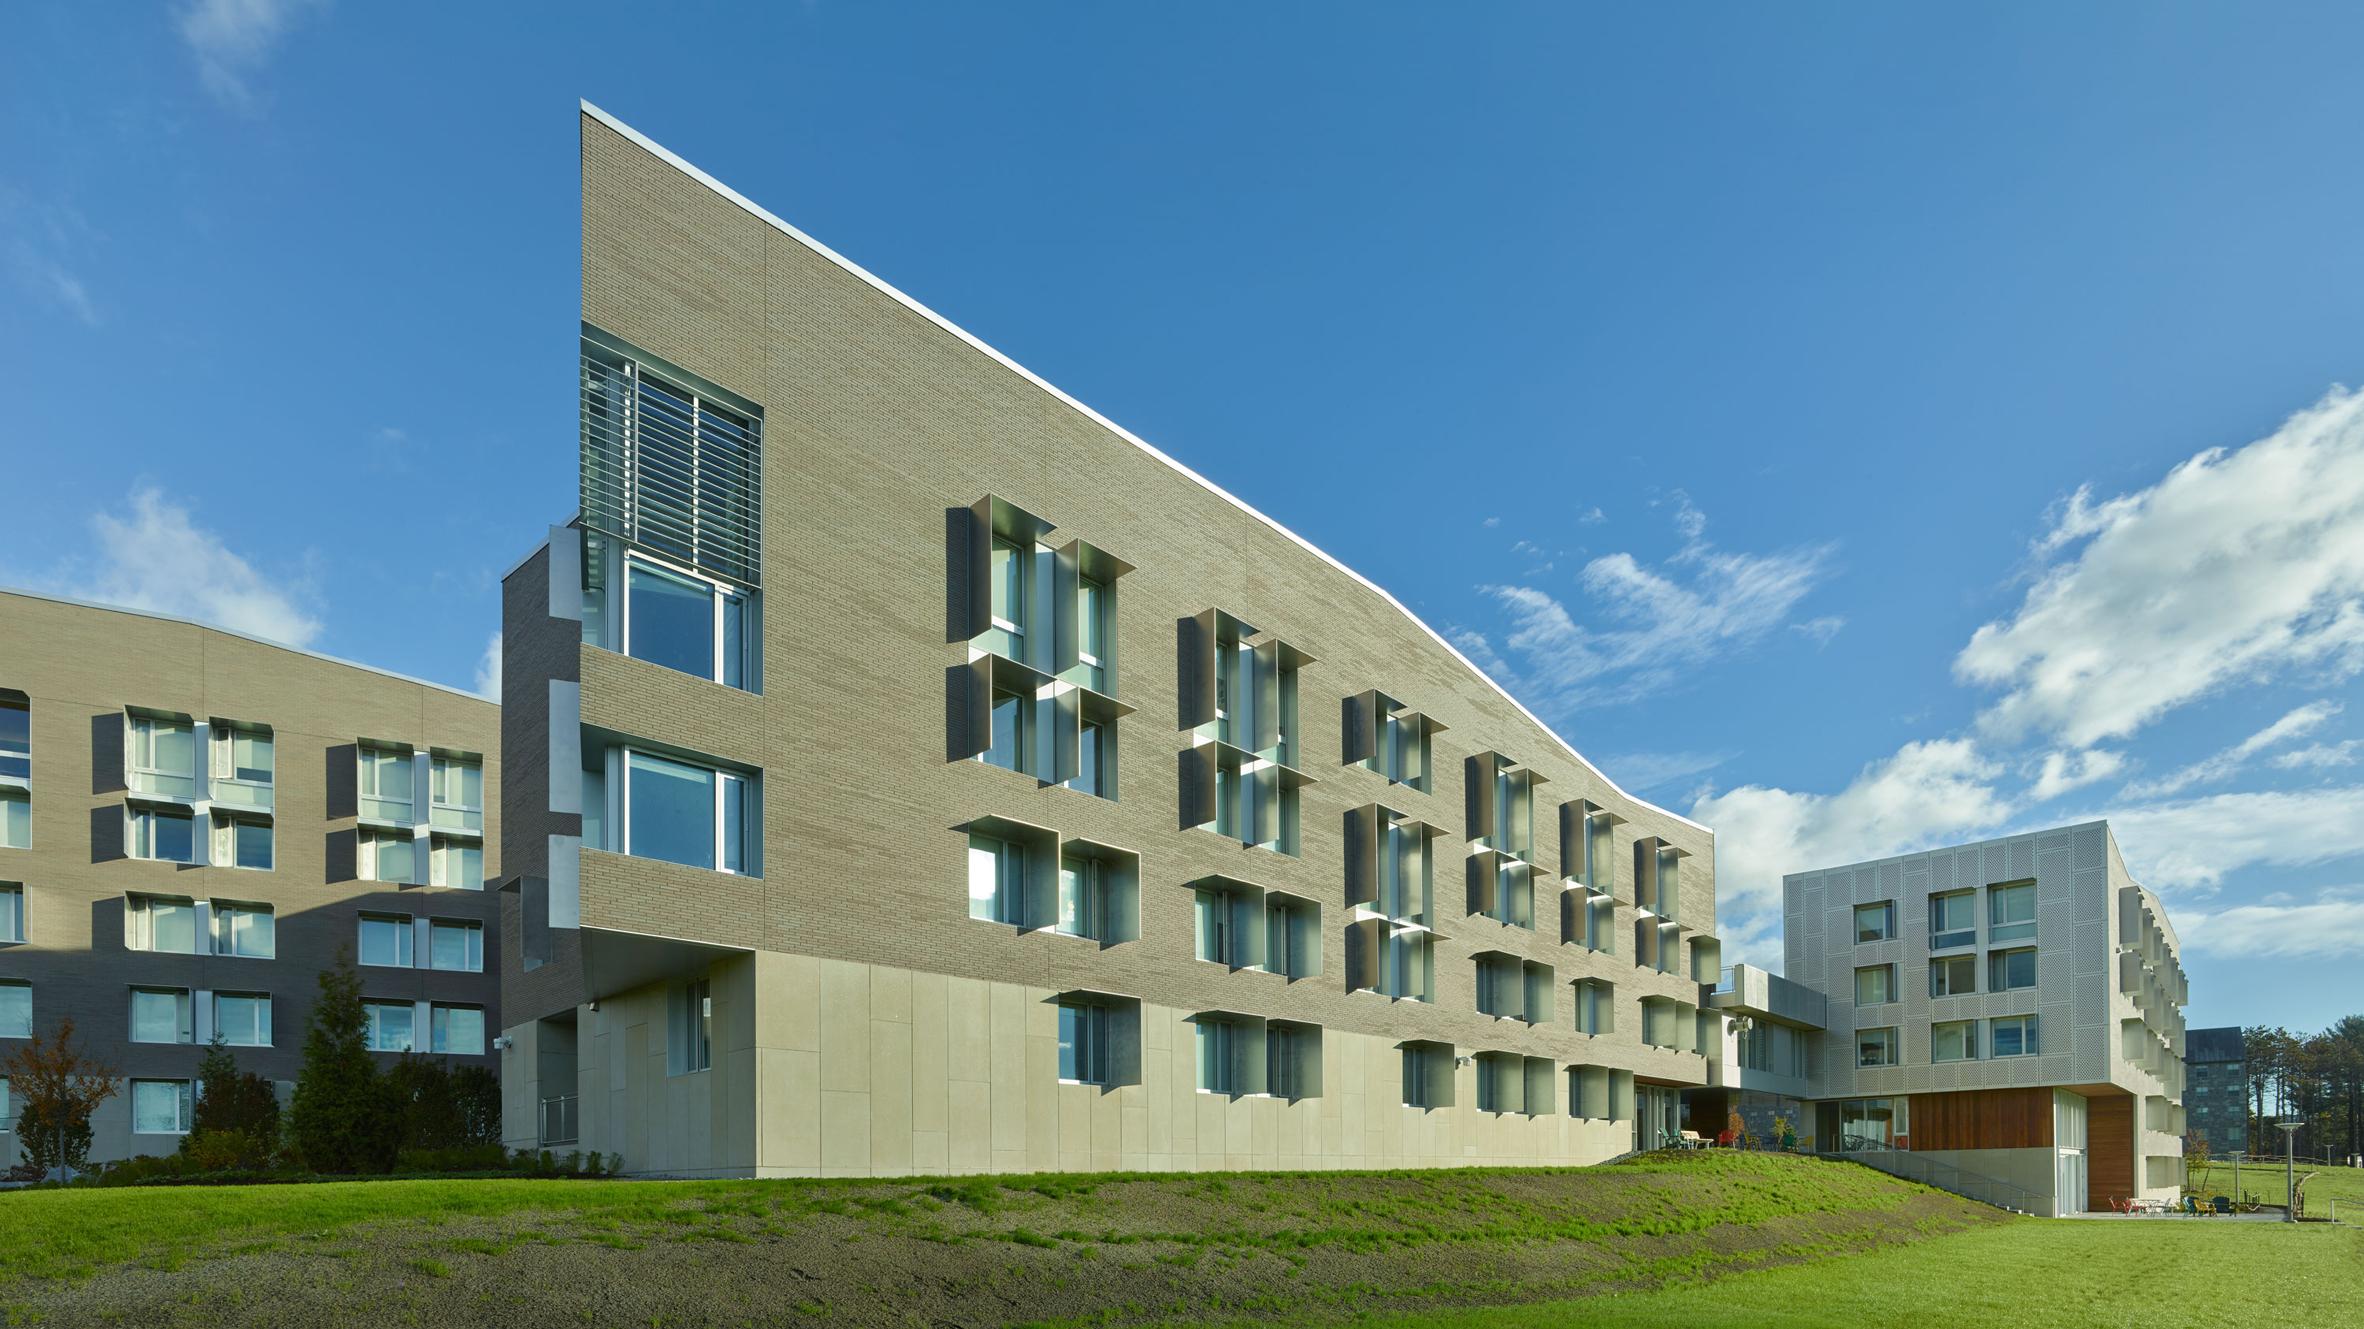 kyu sung woo designs student housing for historic massachusetts